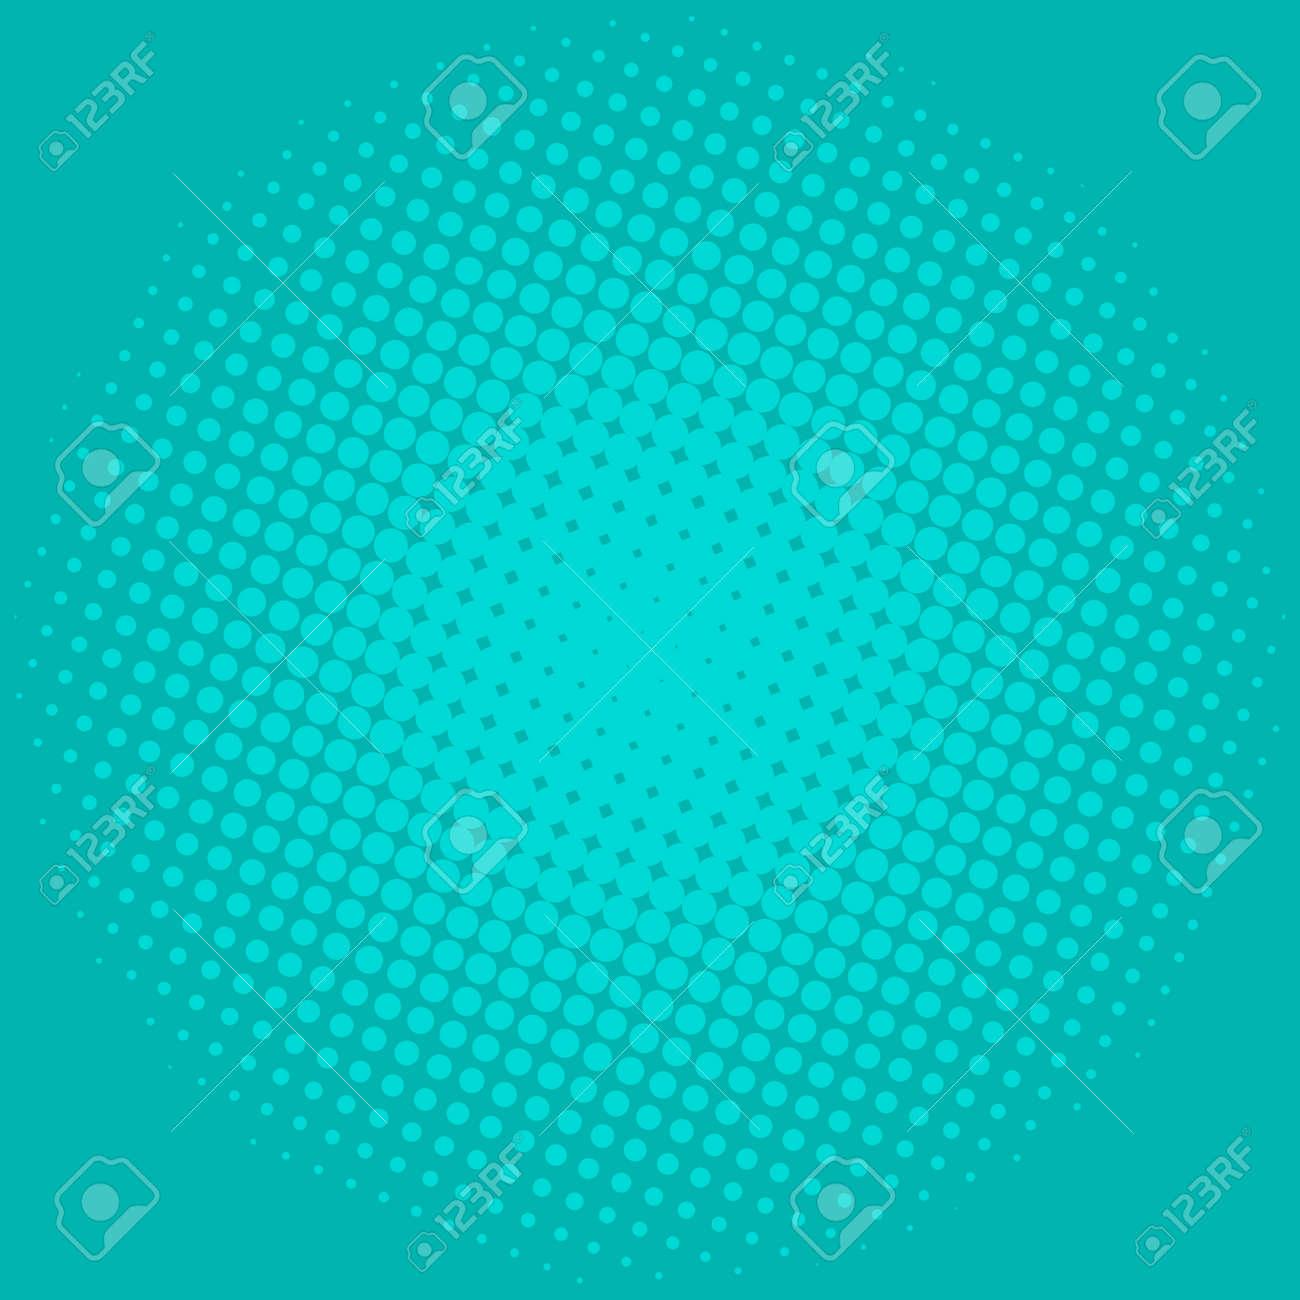 Green blue background vector illustration. - 93230881